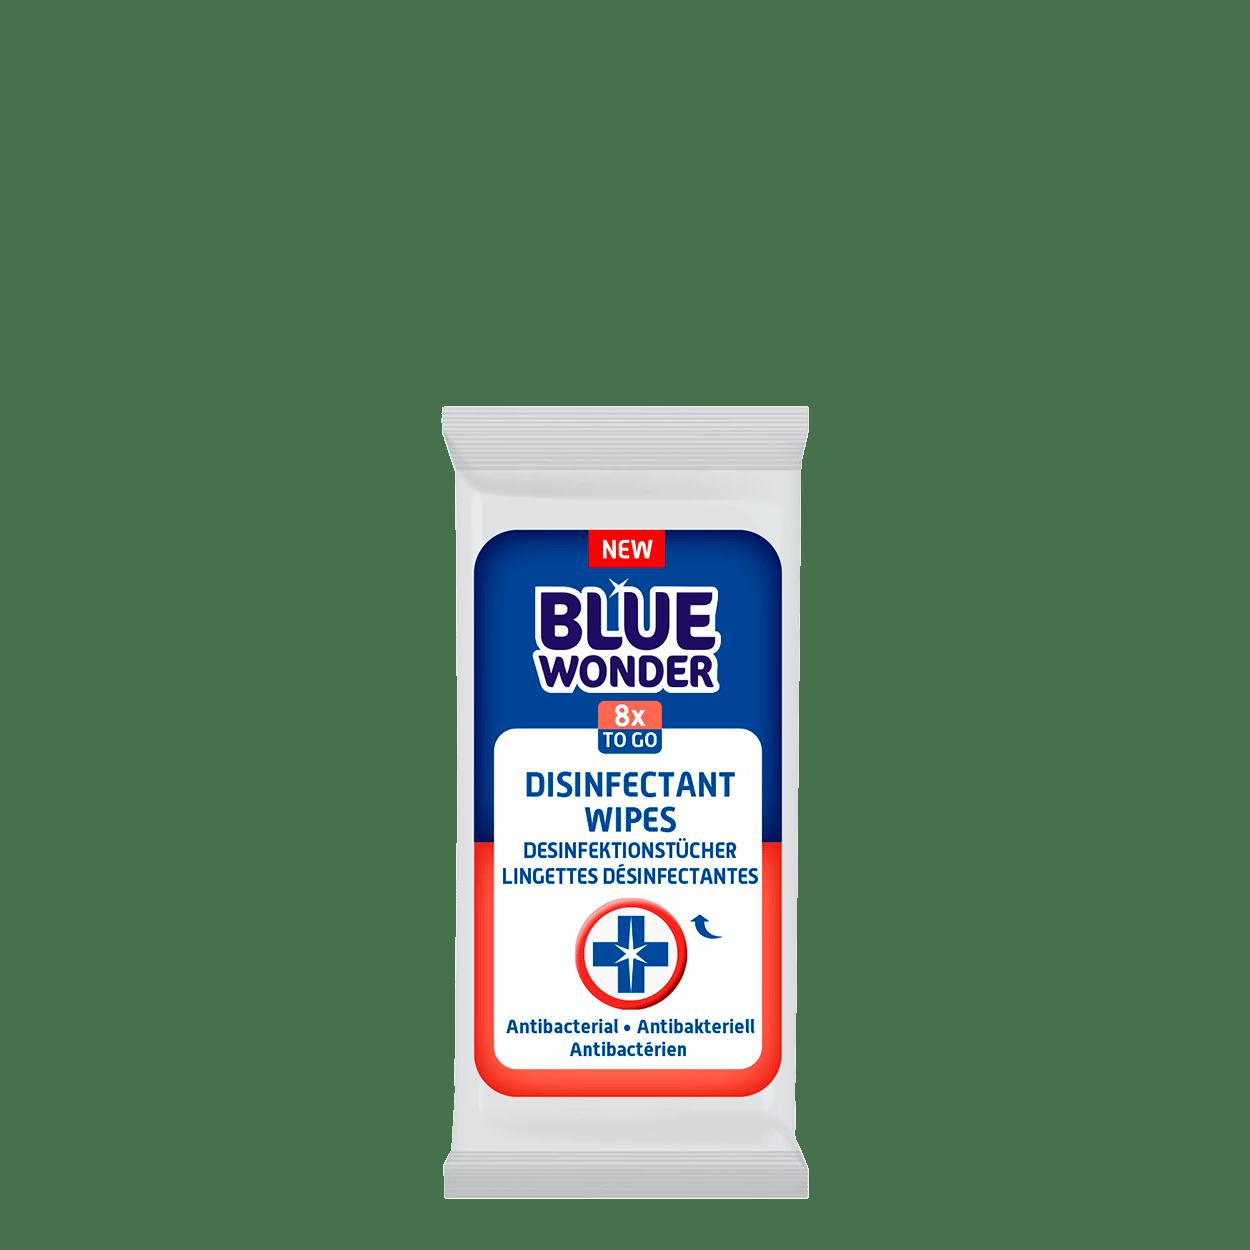 Blue Wonder Disinfectant wipes Desinfektionstucher Lingettes desinfectantes 1x8 front